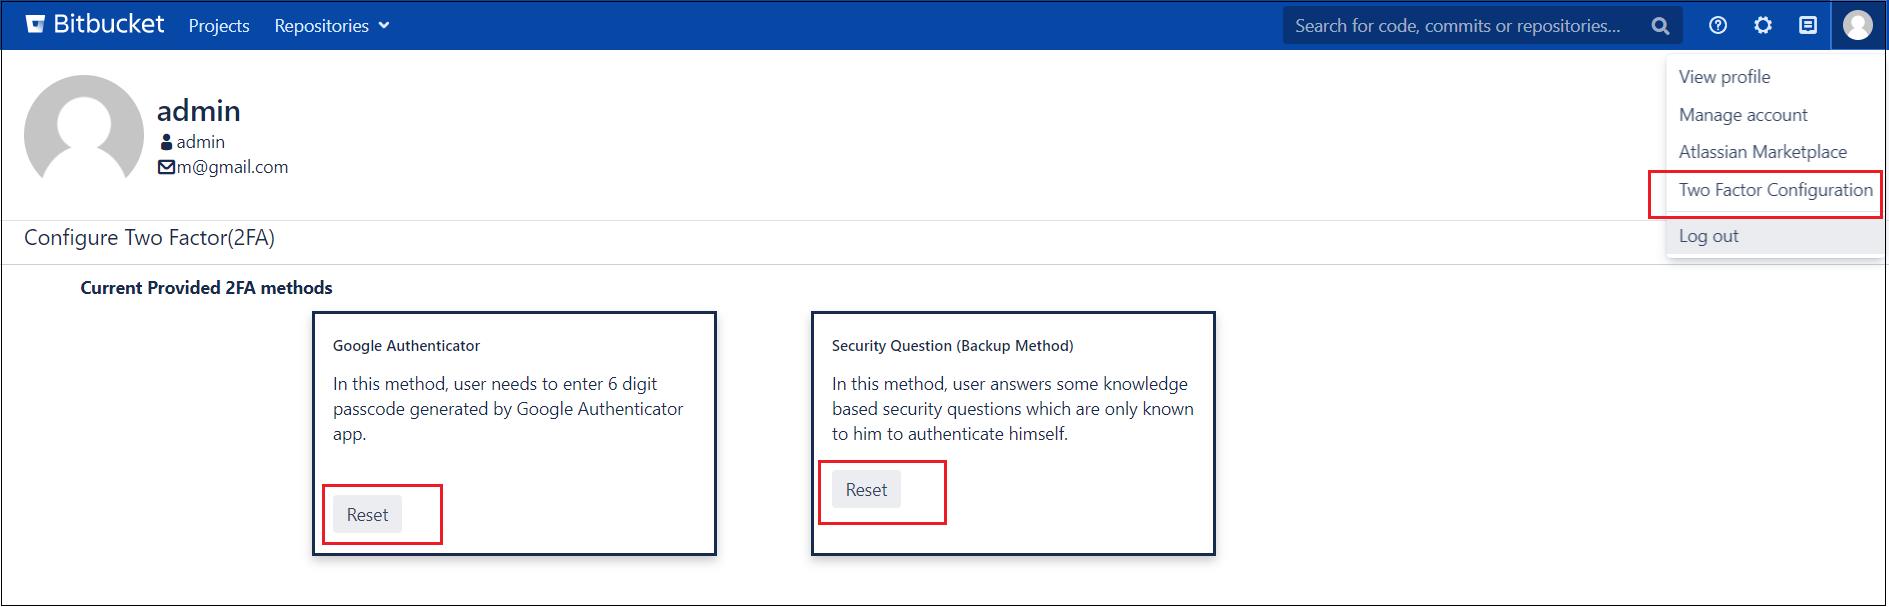 Two factor Authentication (2FA) for Bitbucket bitbucket 2fa/TFA